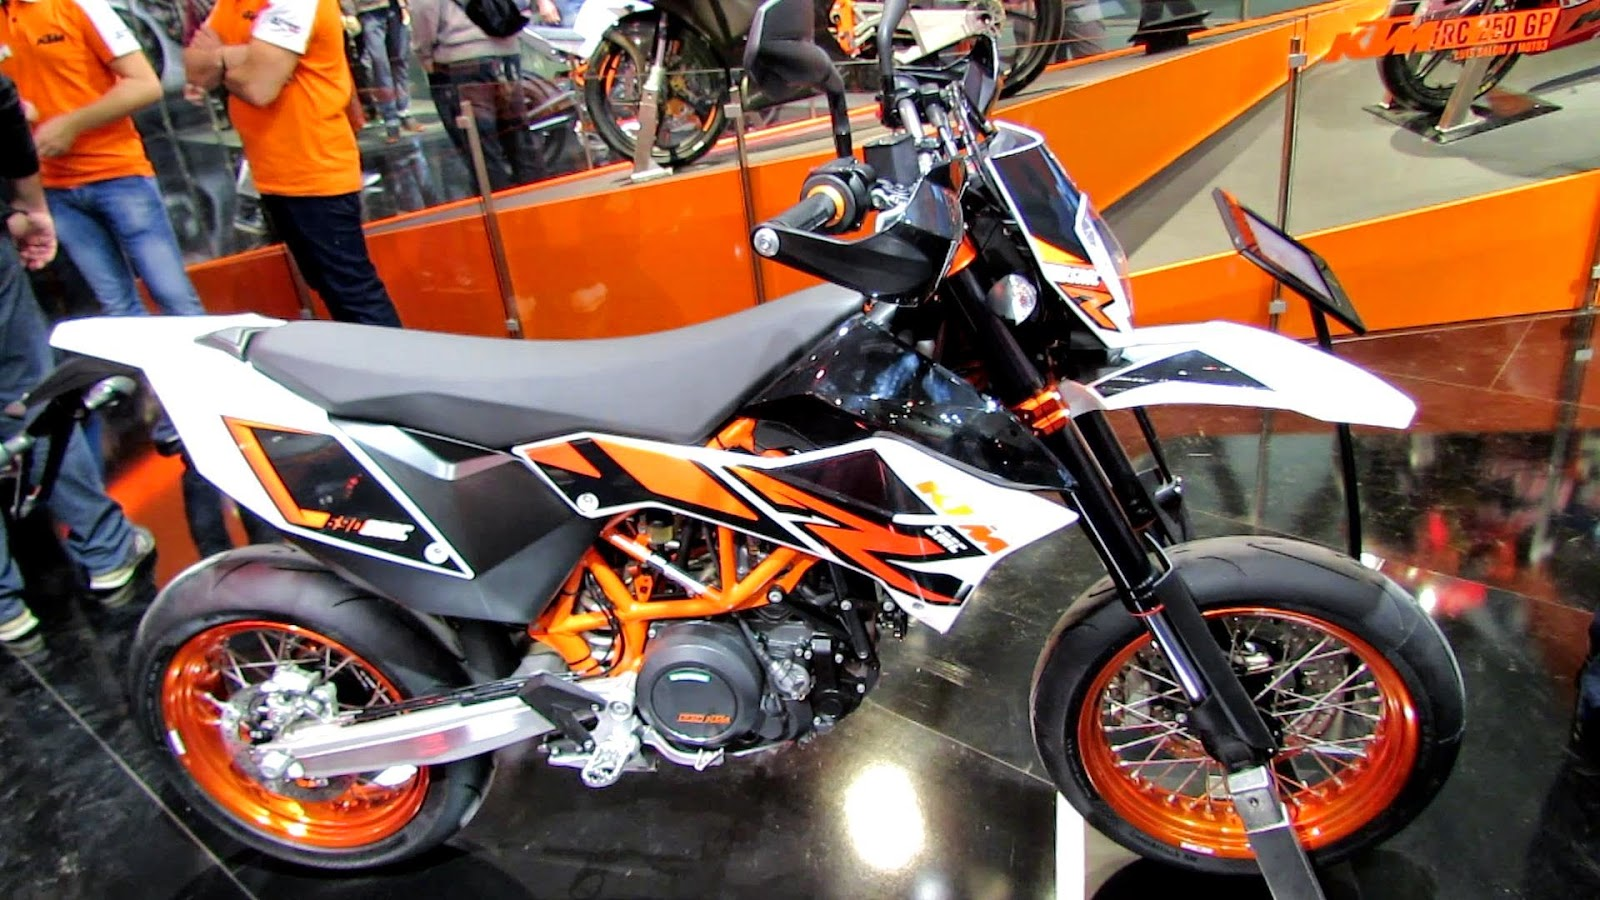 KTM 690 Supermoto Sports Bikes Gallery